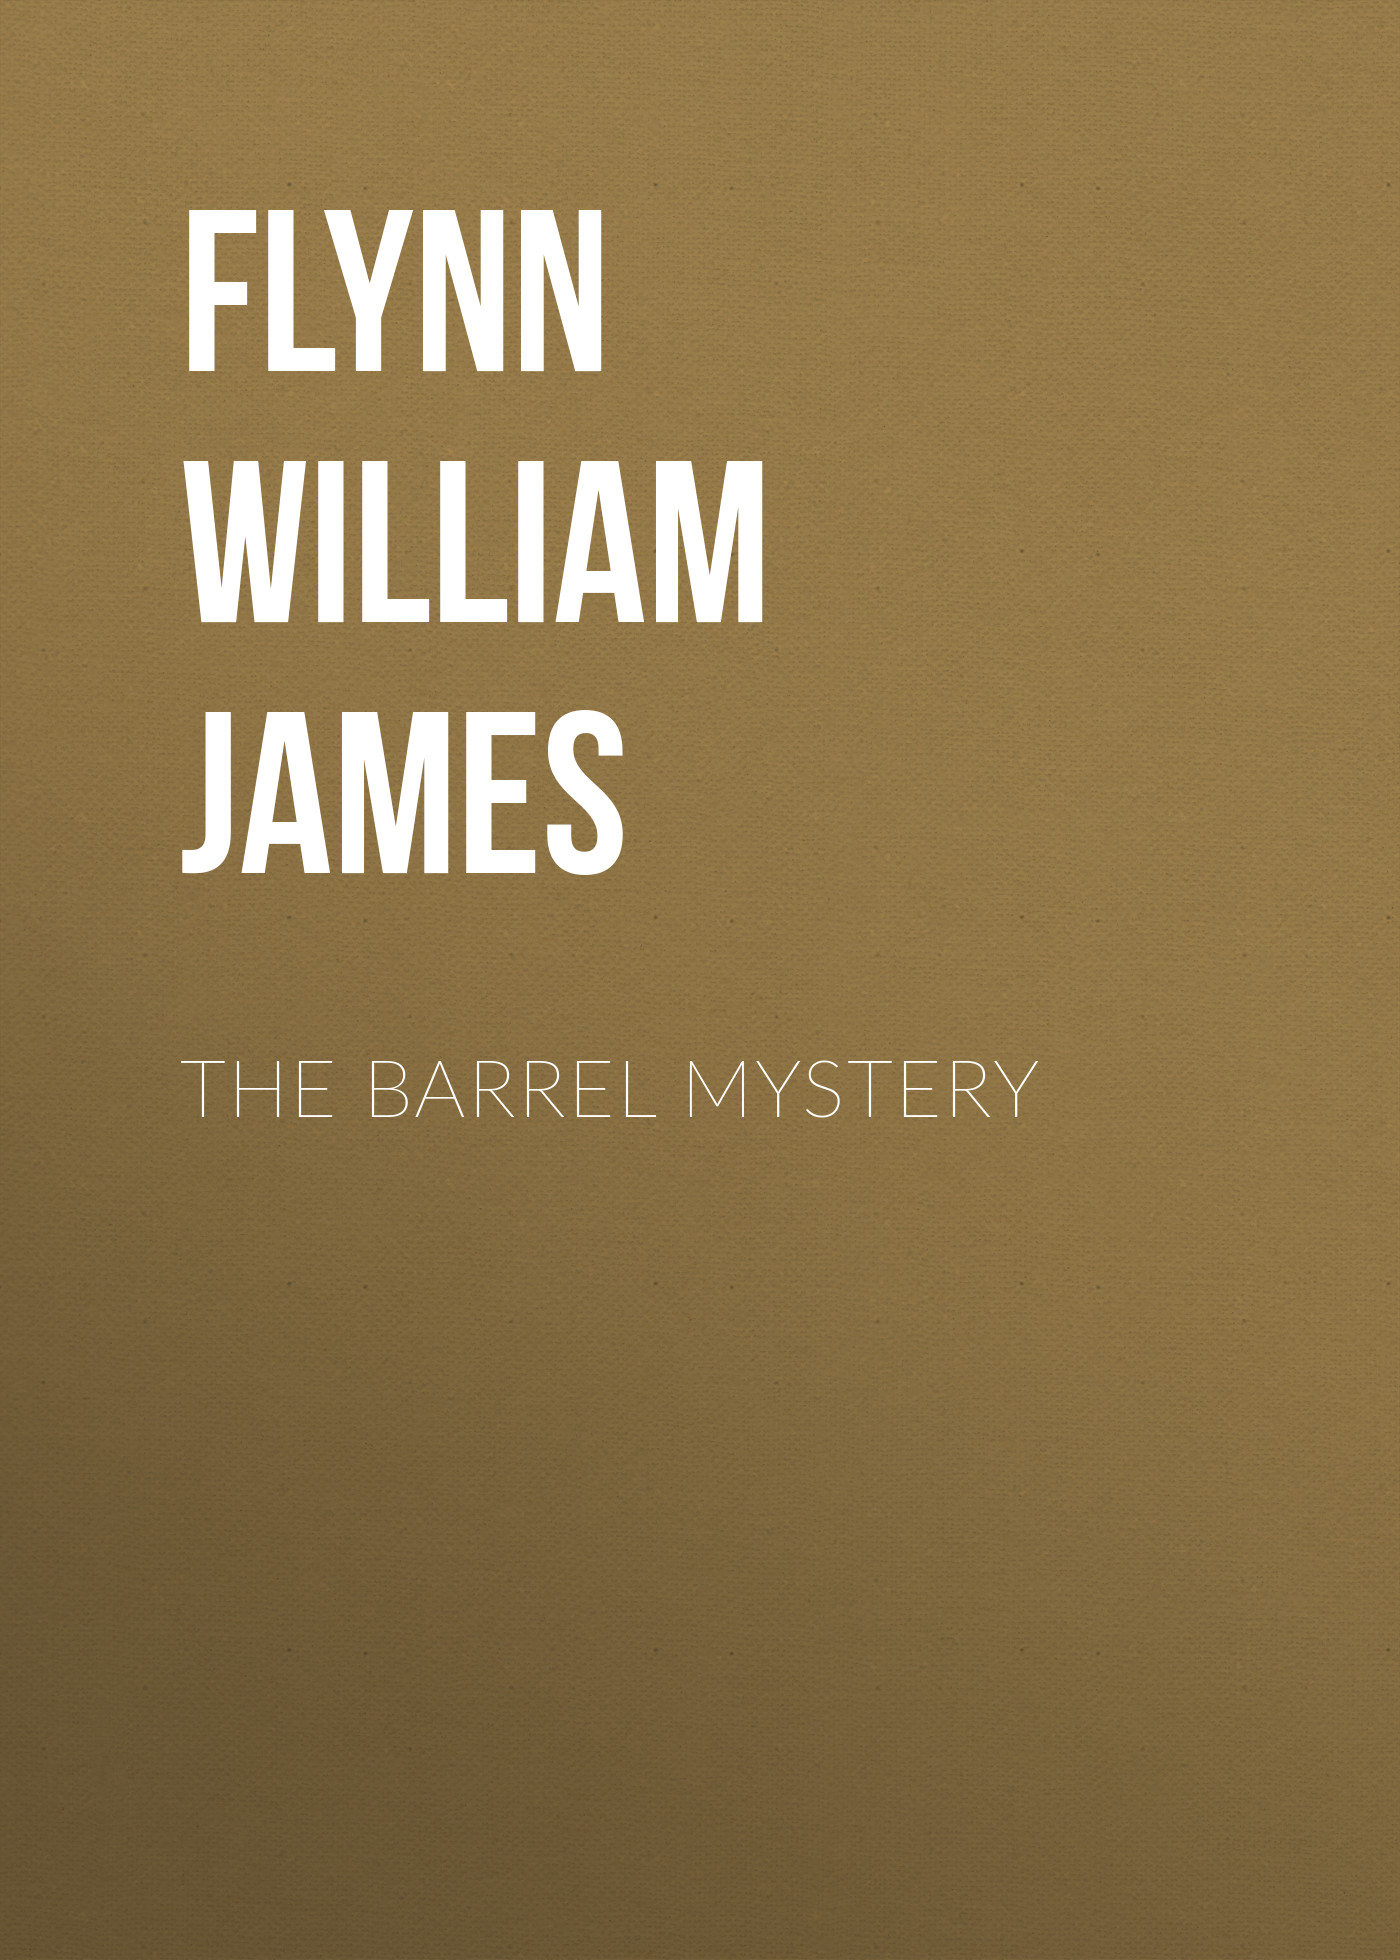 Flynn William James The Barrel Mystery